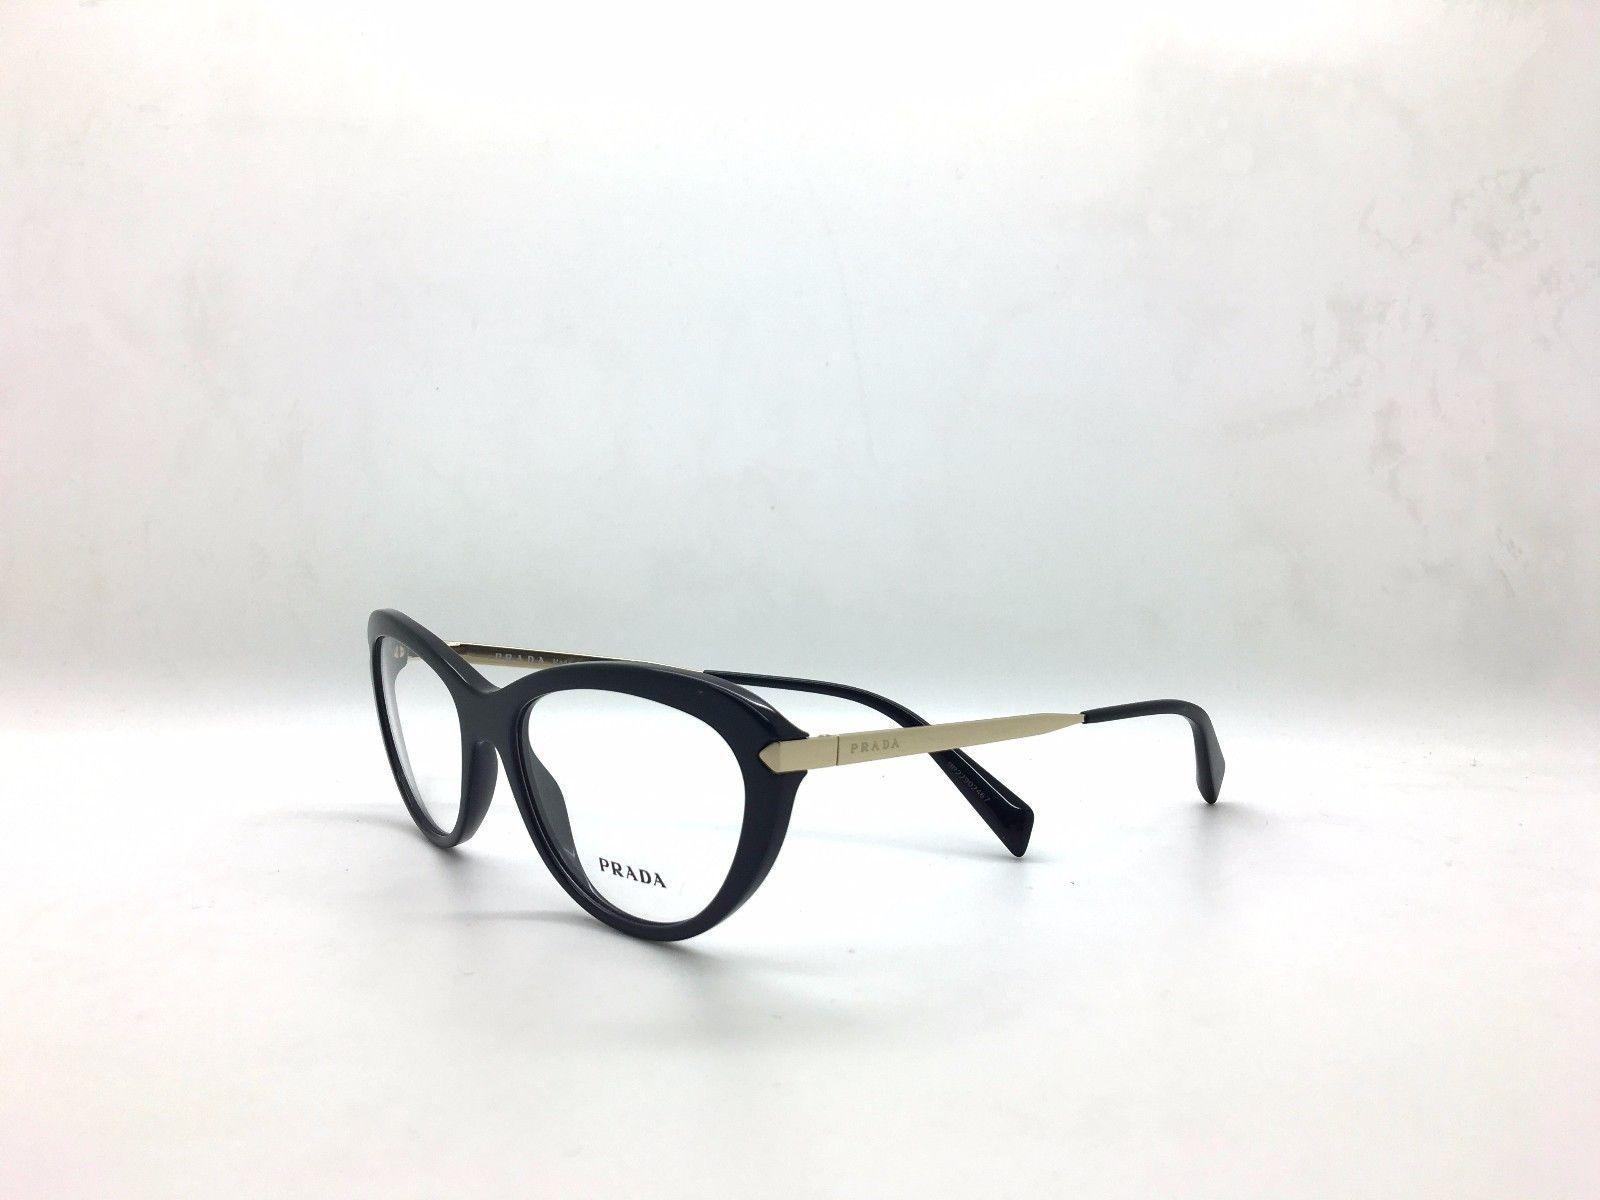 0fdc2987a8 Prada VPR 08R 1AB-1O1 Black on Gold New and 21 similar items